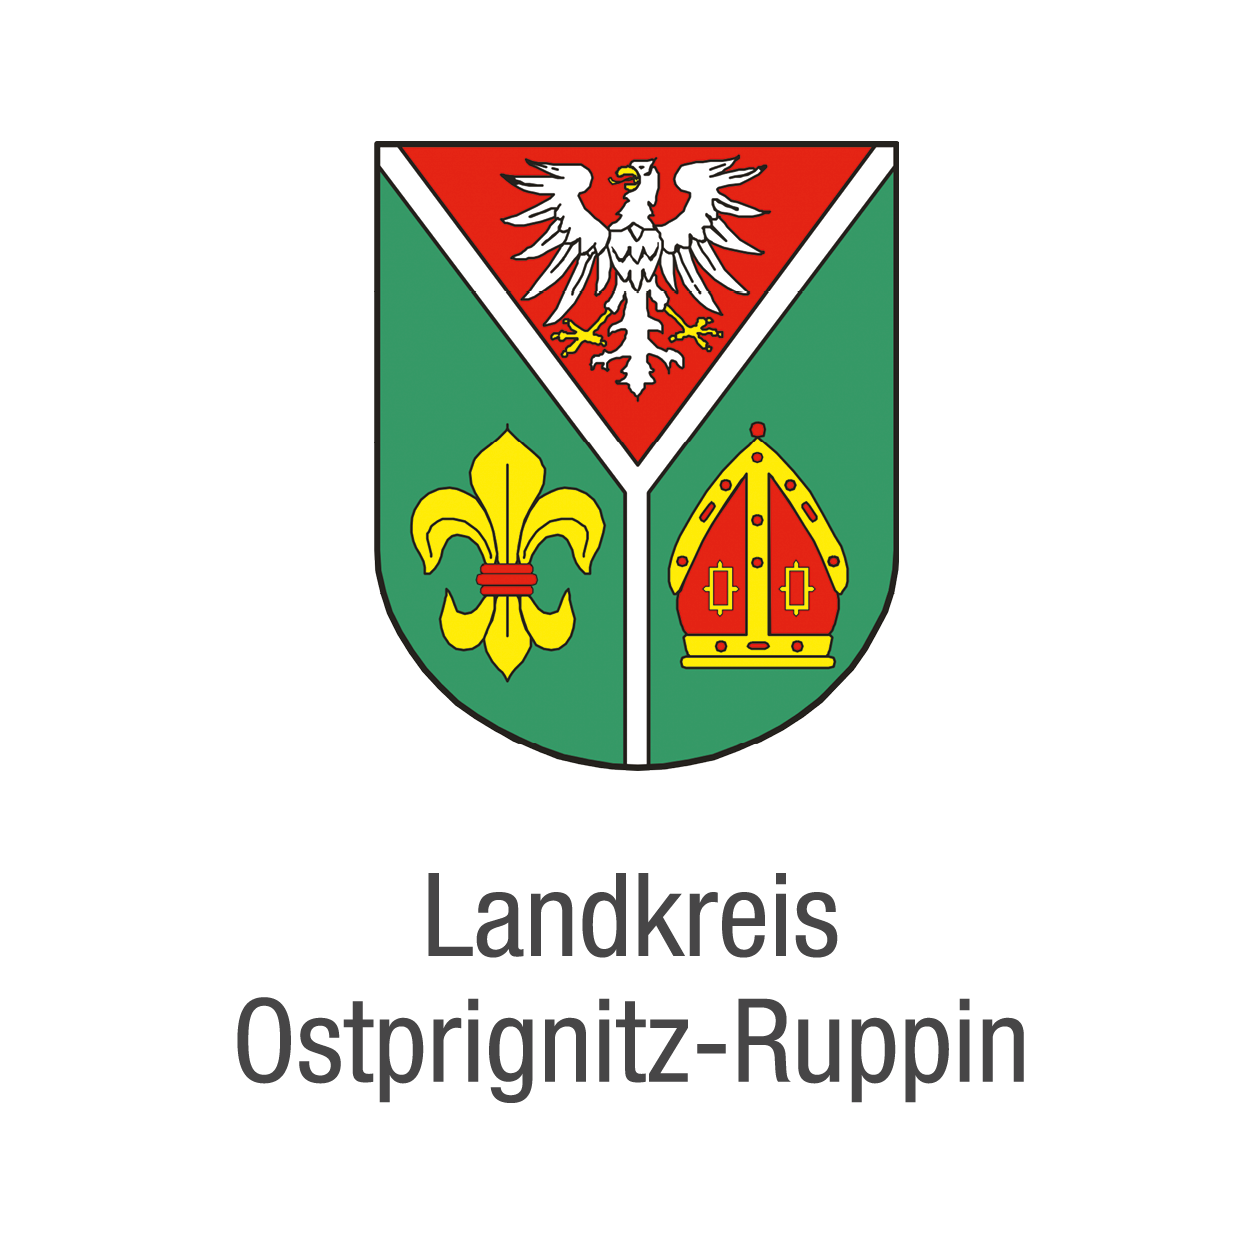 Landkreis Ostprignitz-Ruppin